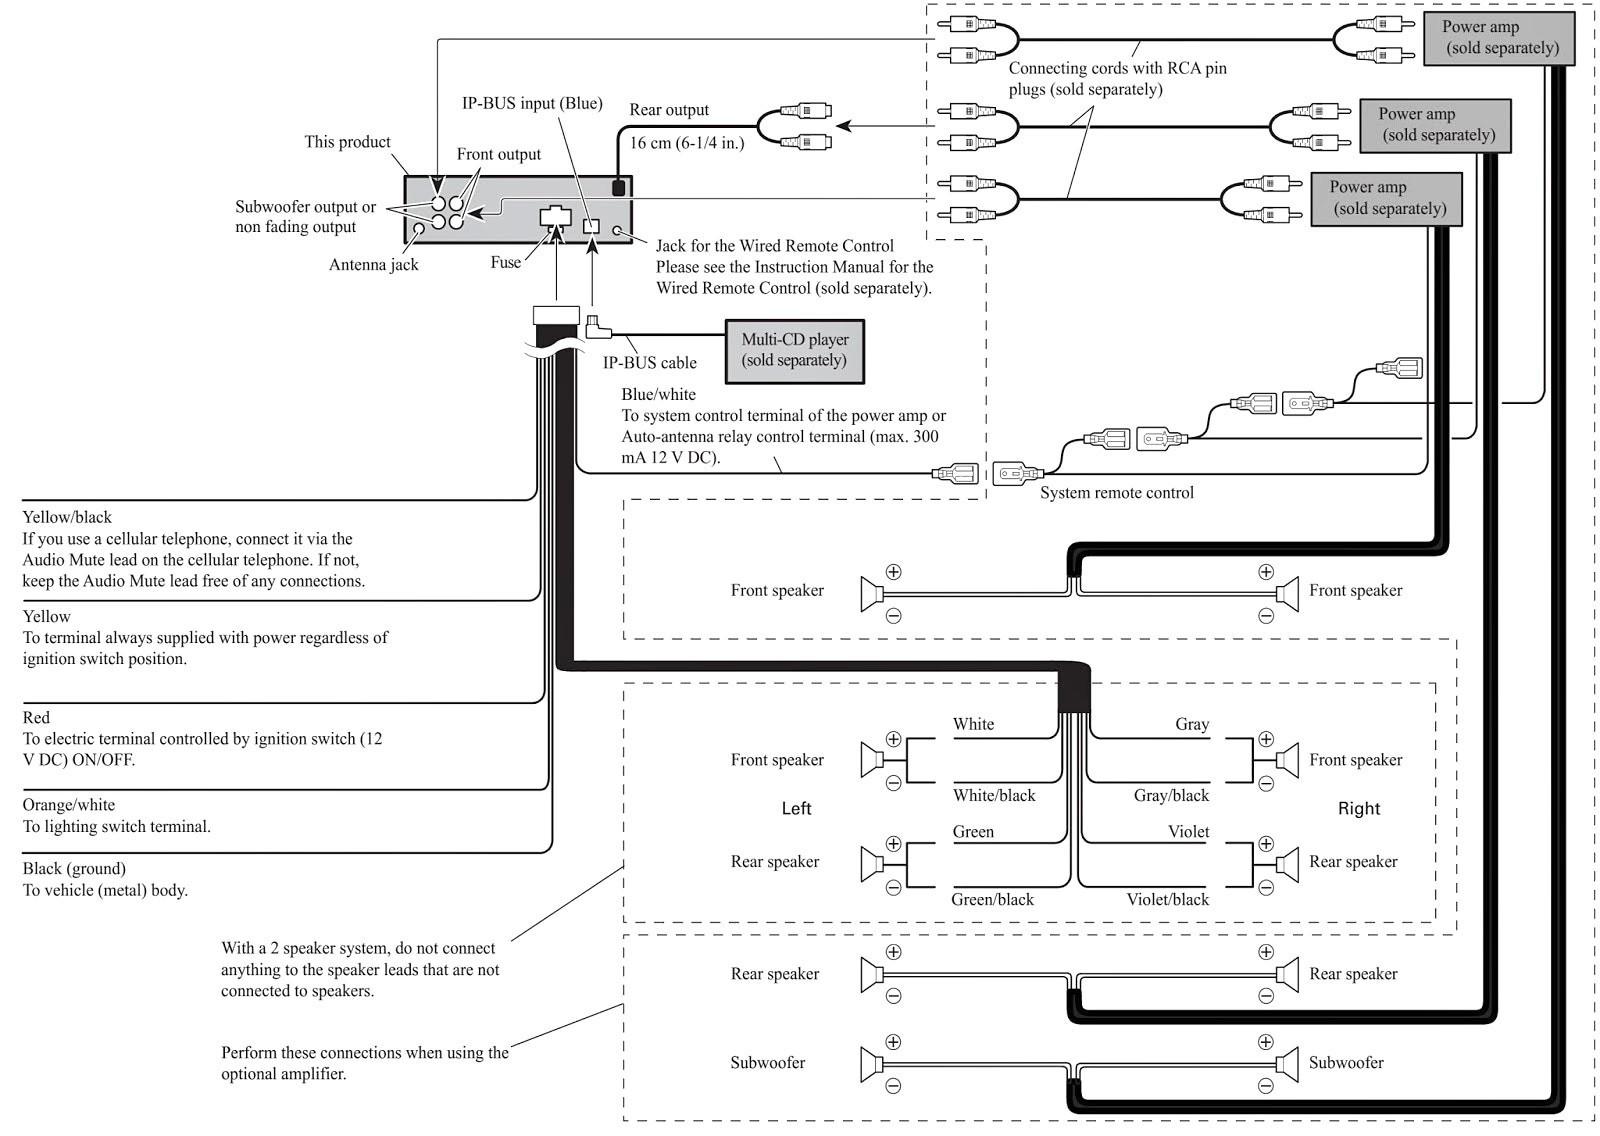 Kd R330 Jvc Car Stereo Wiring Diagram   Wiring Diagram - Jvc Kdr330 Wiring Diagram